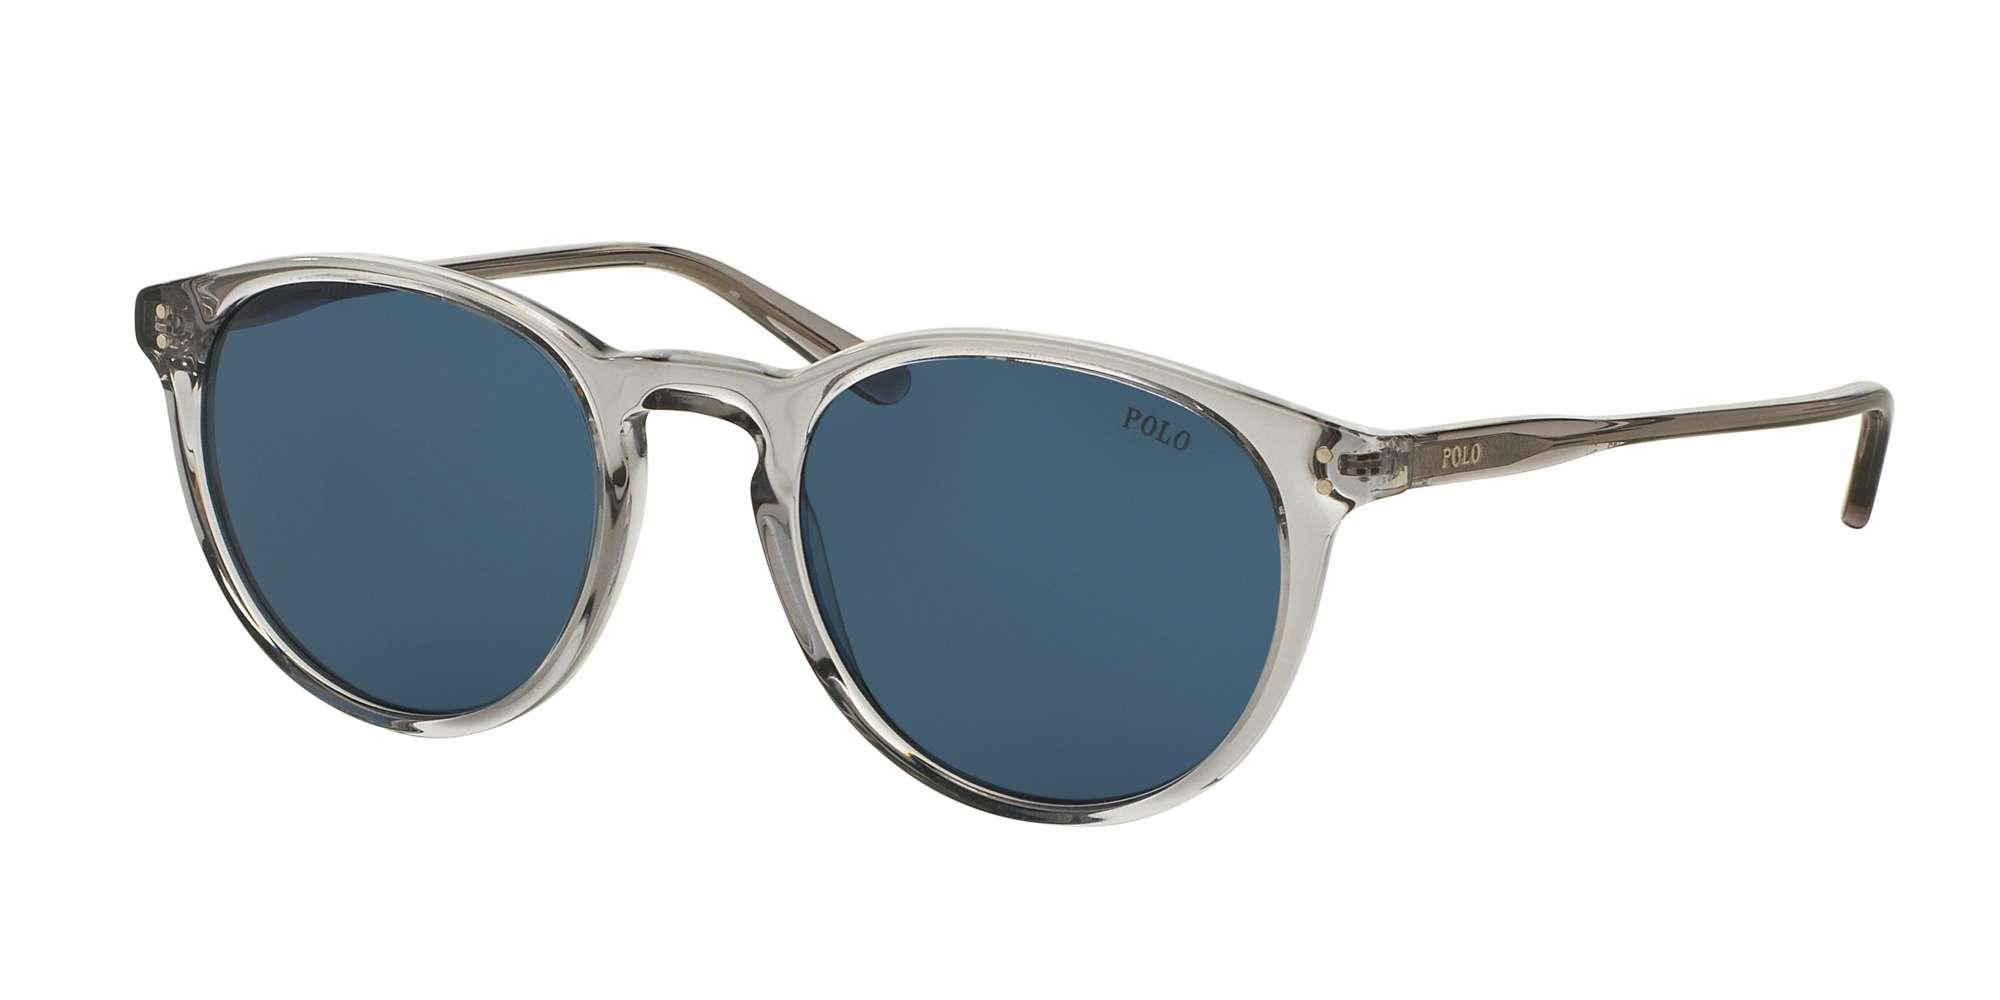 SHINY SEMI TRASP GREY / DARK BLUE lenses